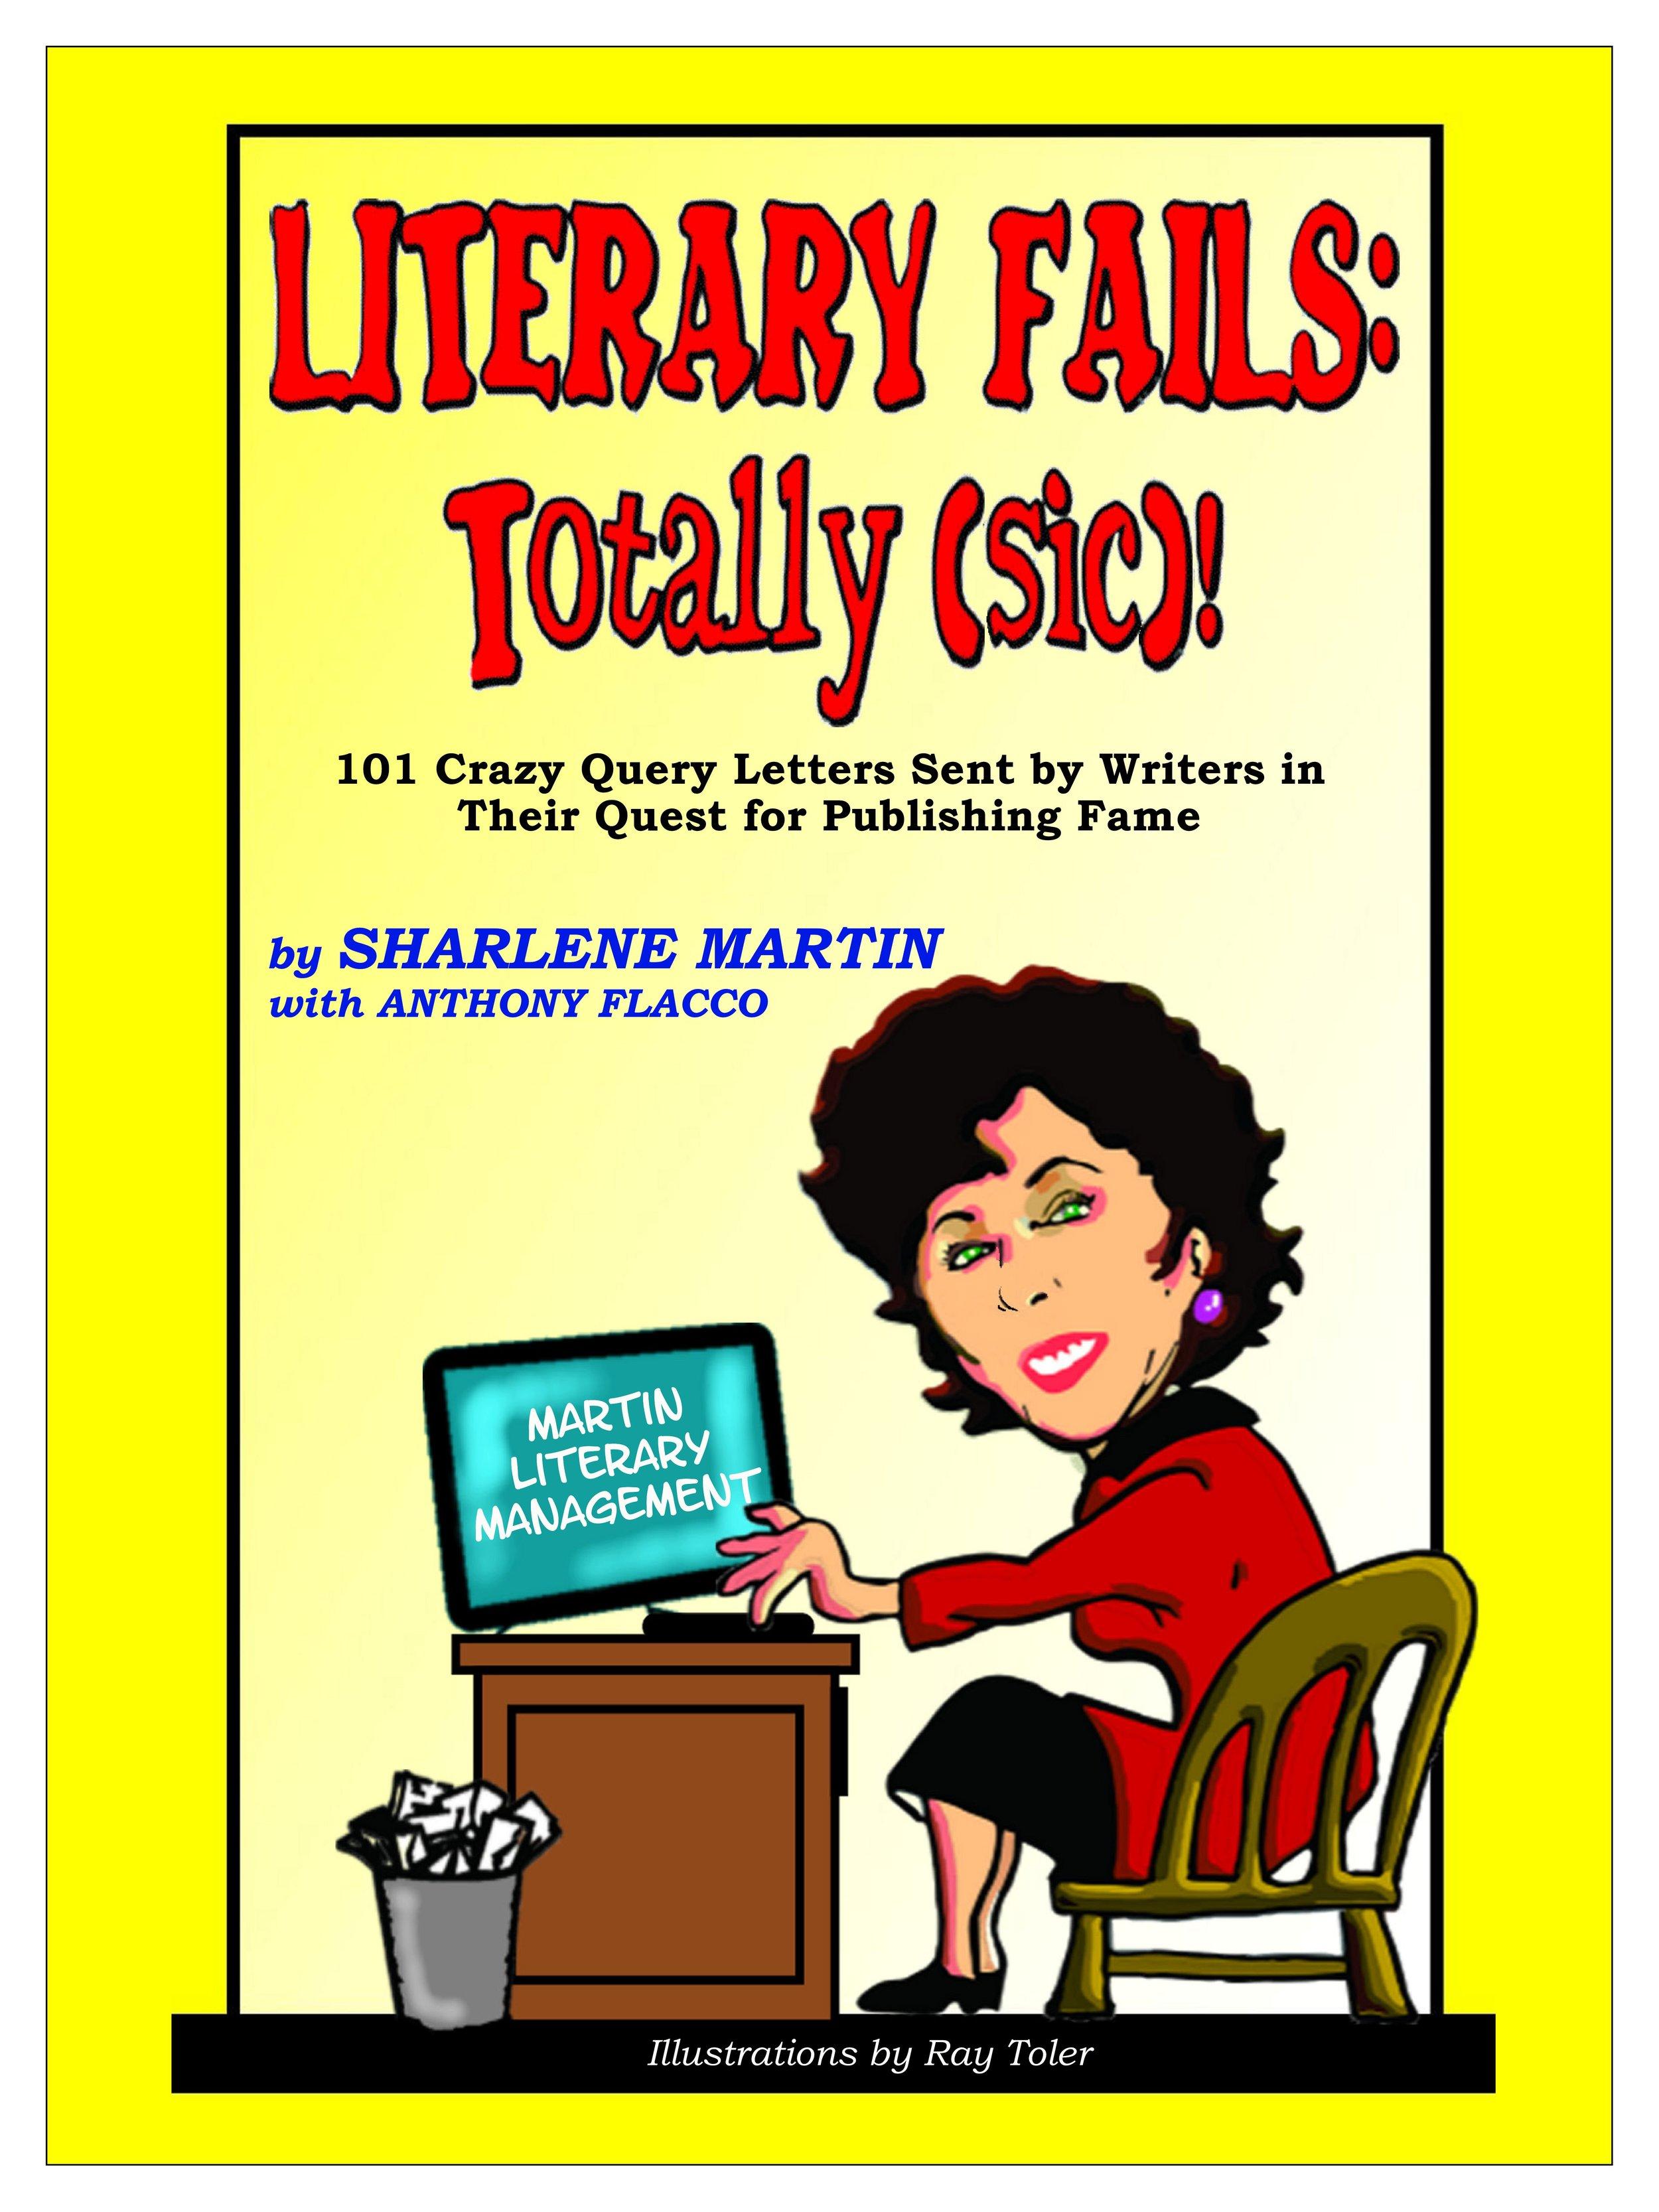 literary fails small.jpg